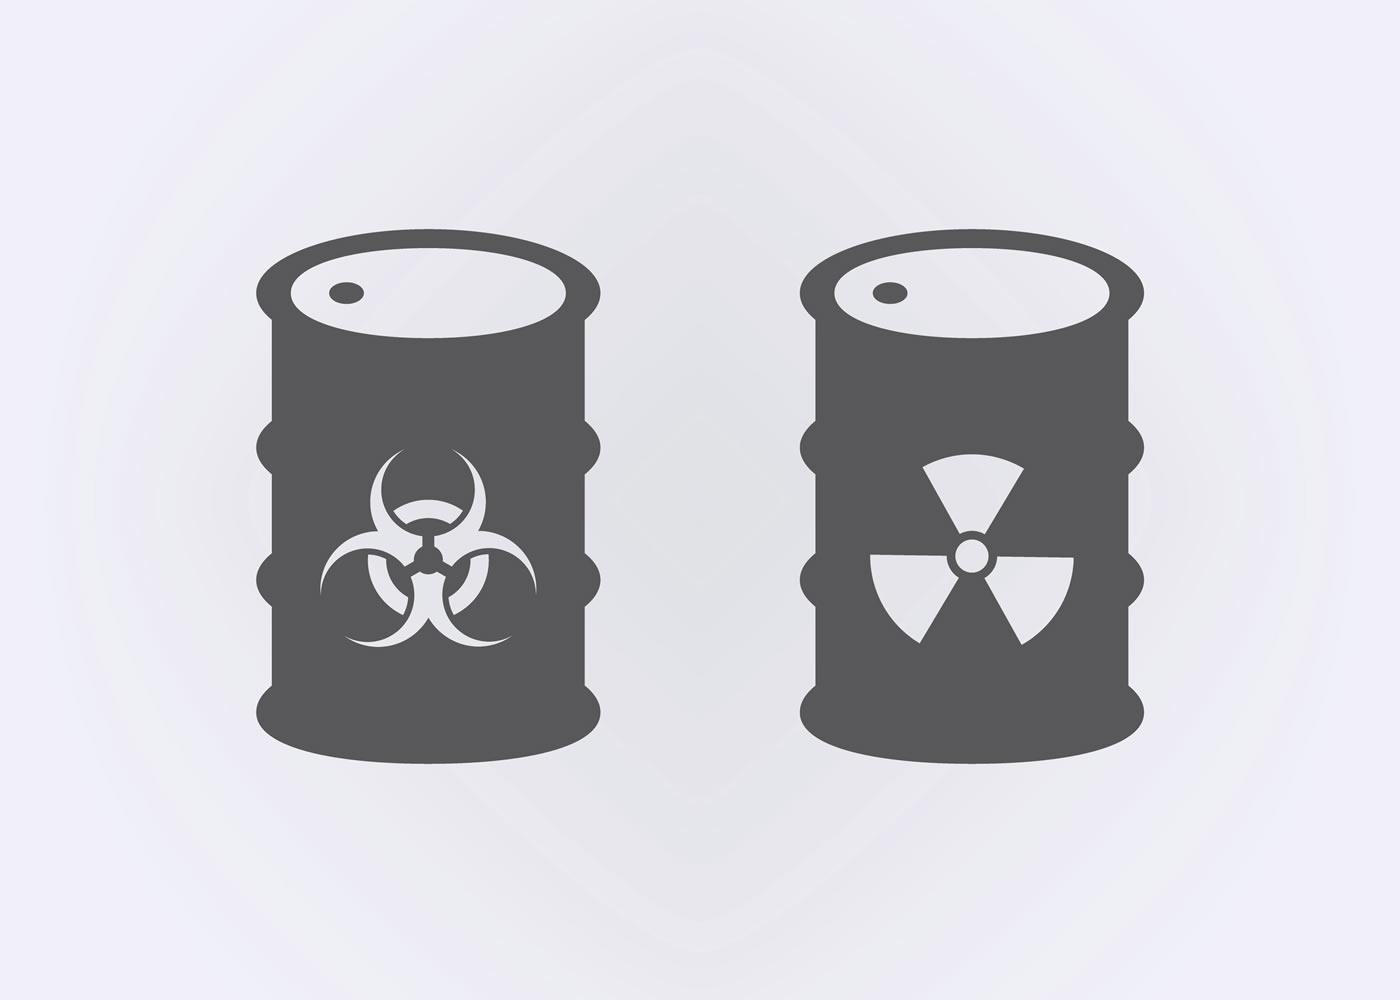 naem-research-quickpolls-2015-12-hazardous-waste-treatment-facilities-700x500